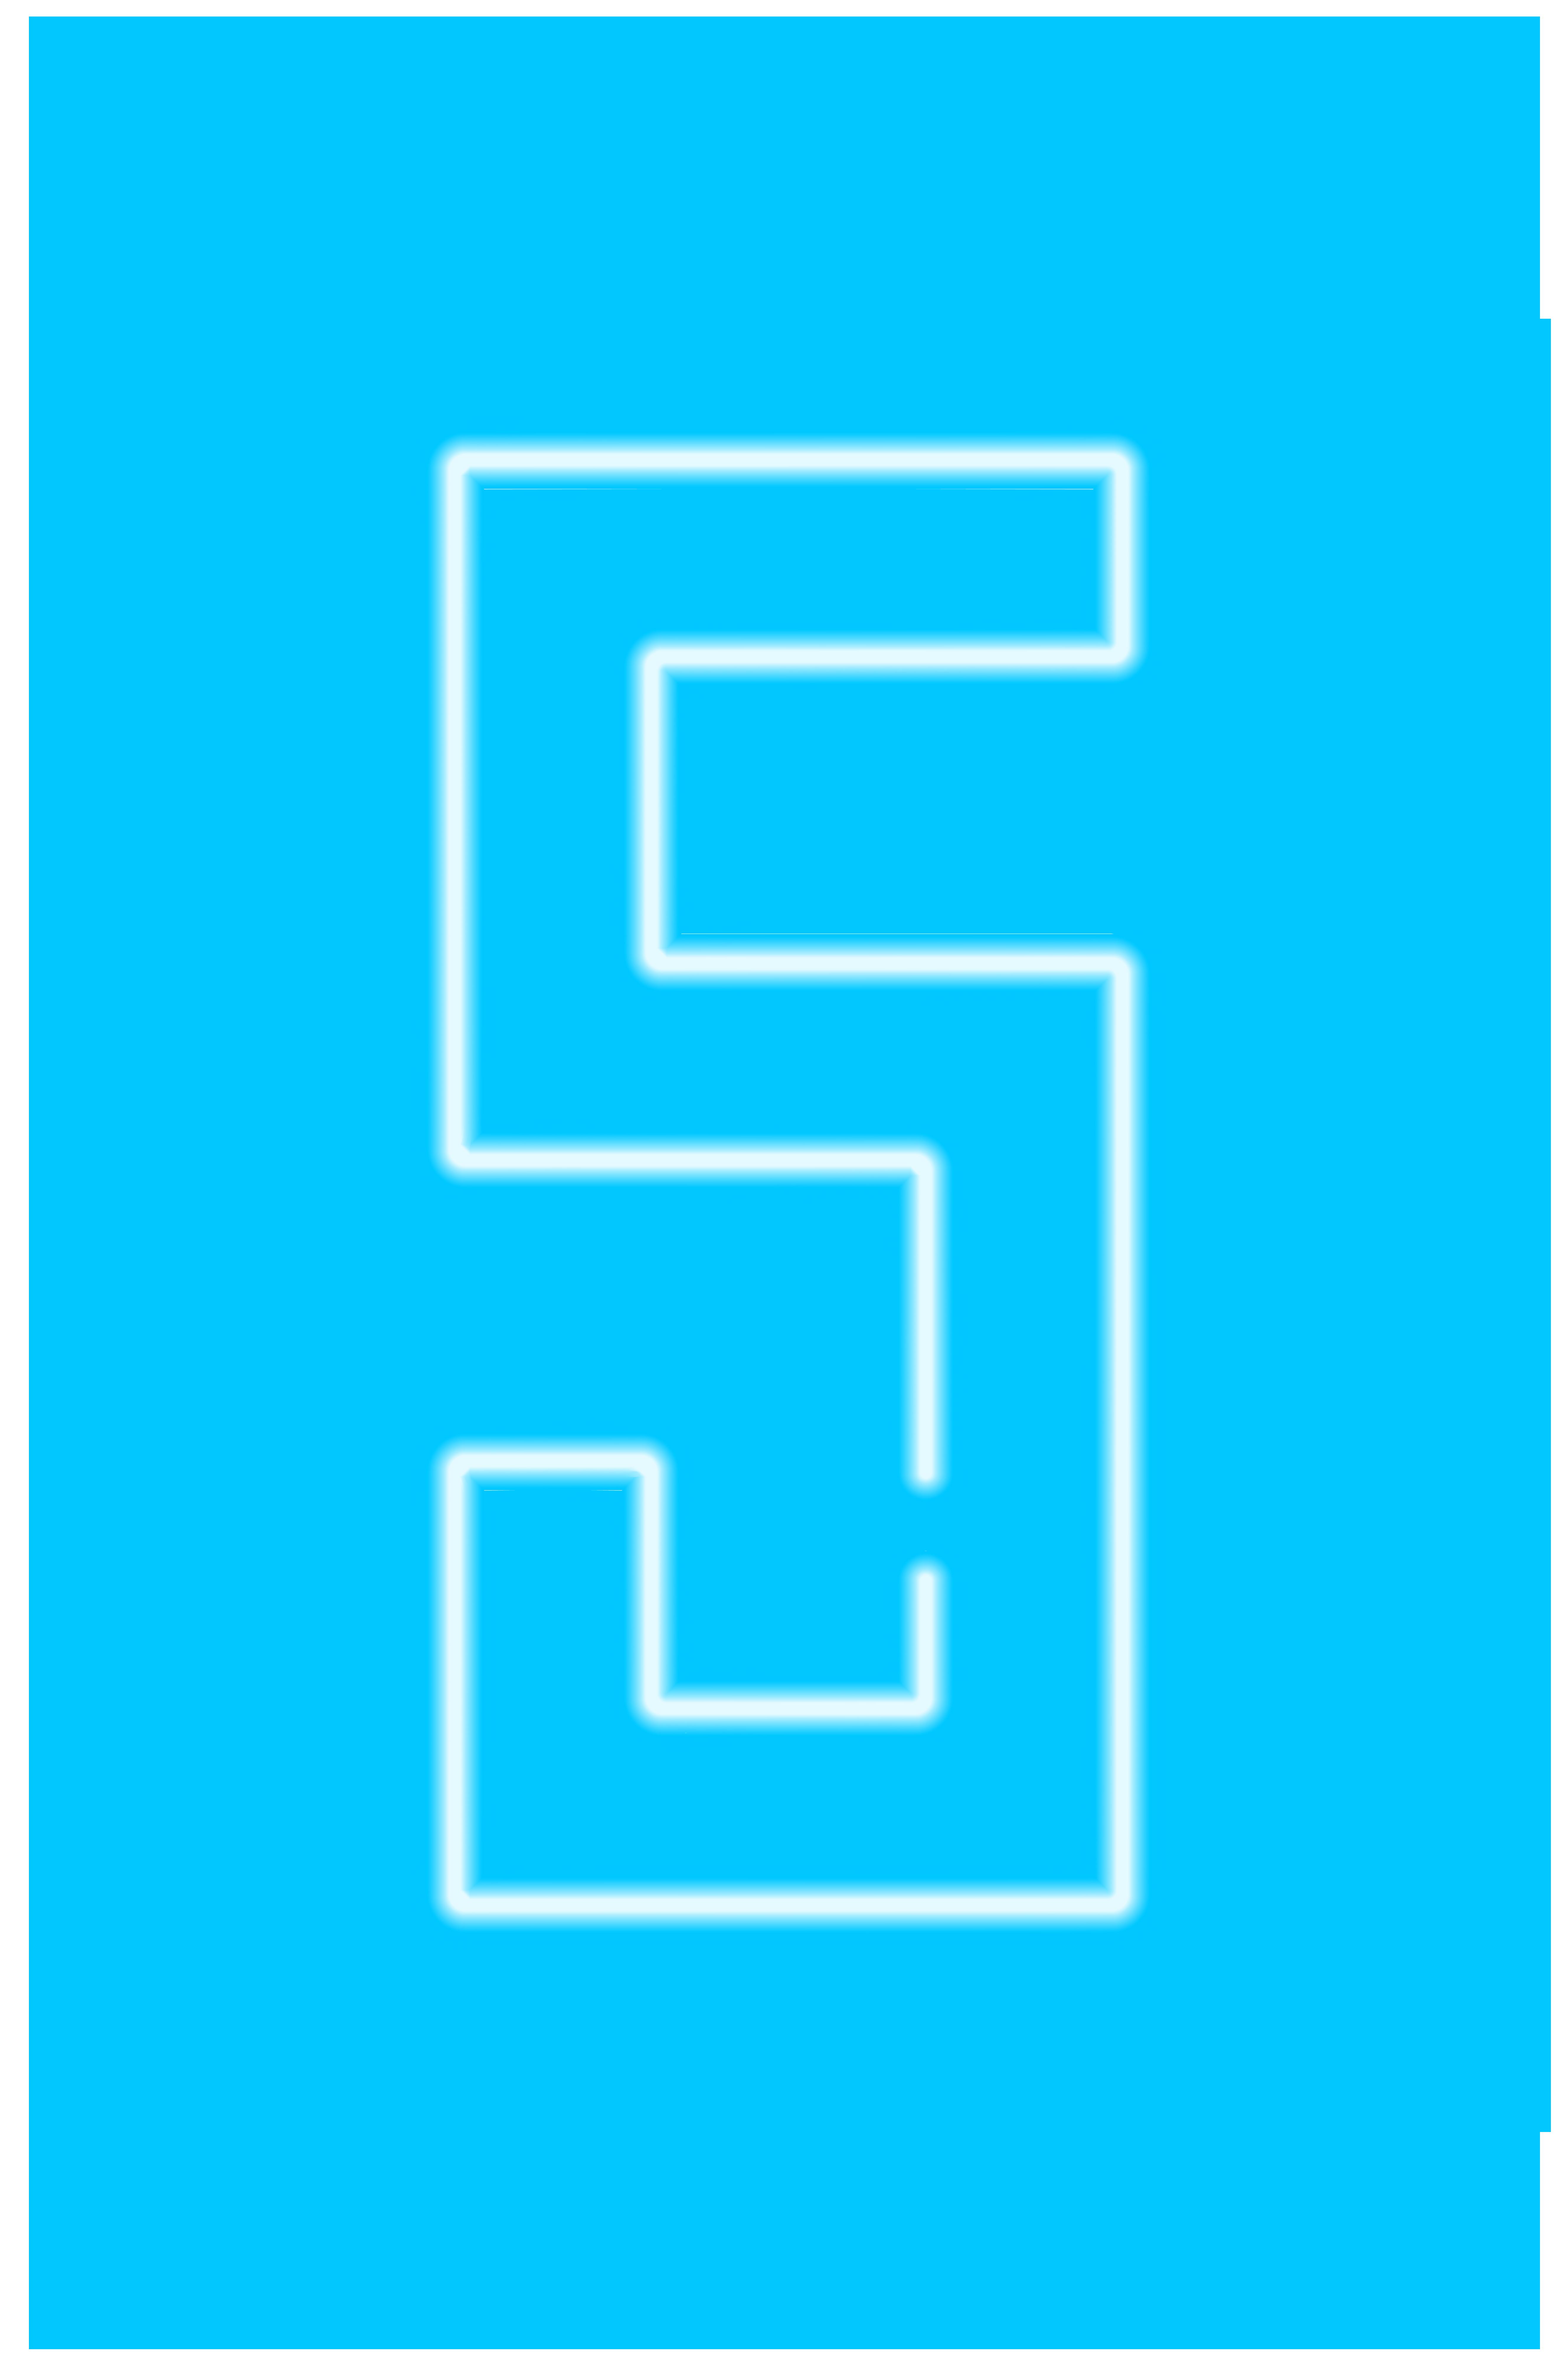 Neon Number Five Transparent Clip Art Image.